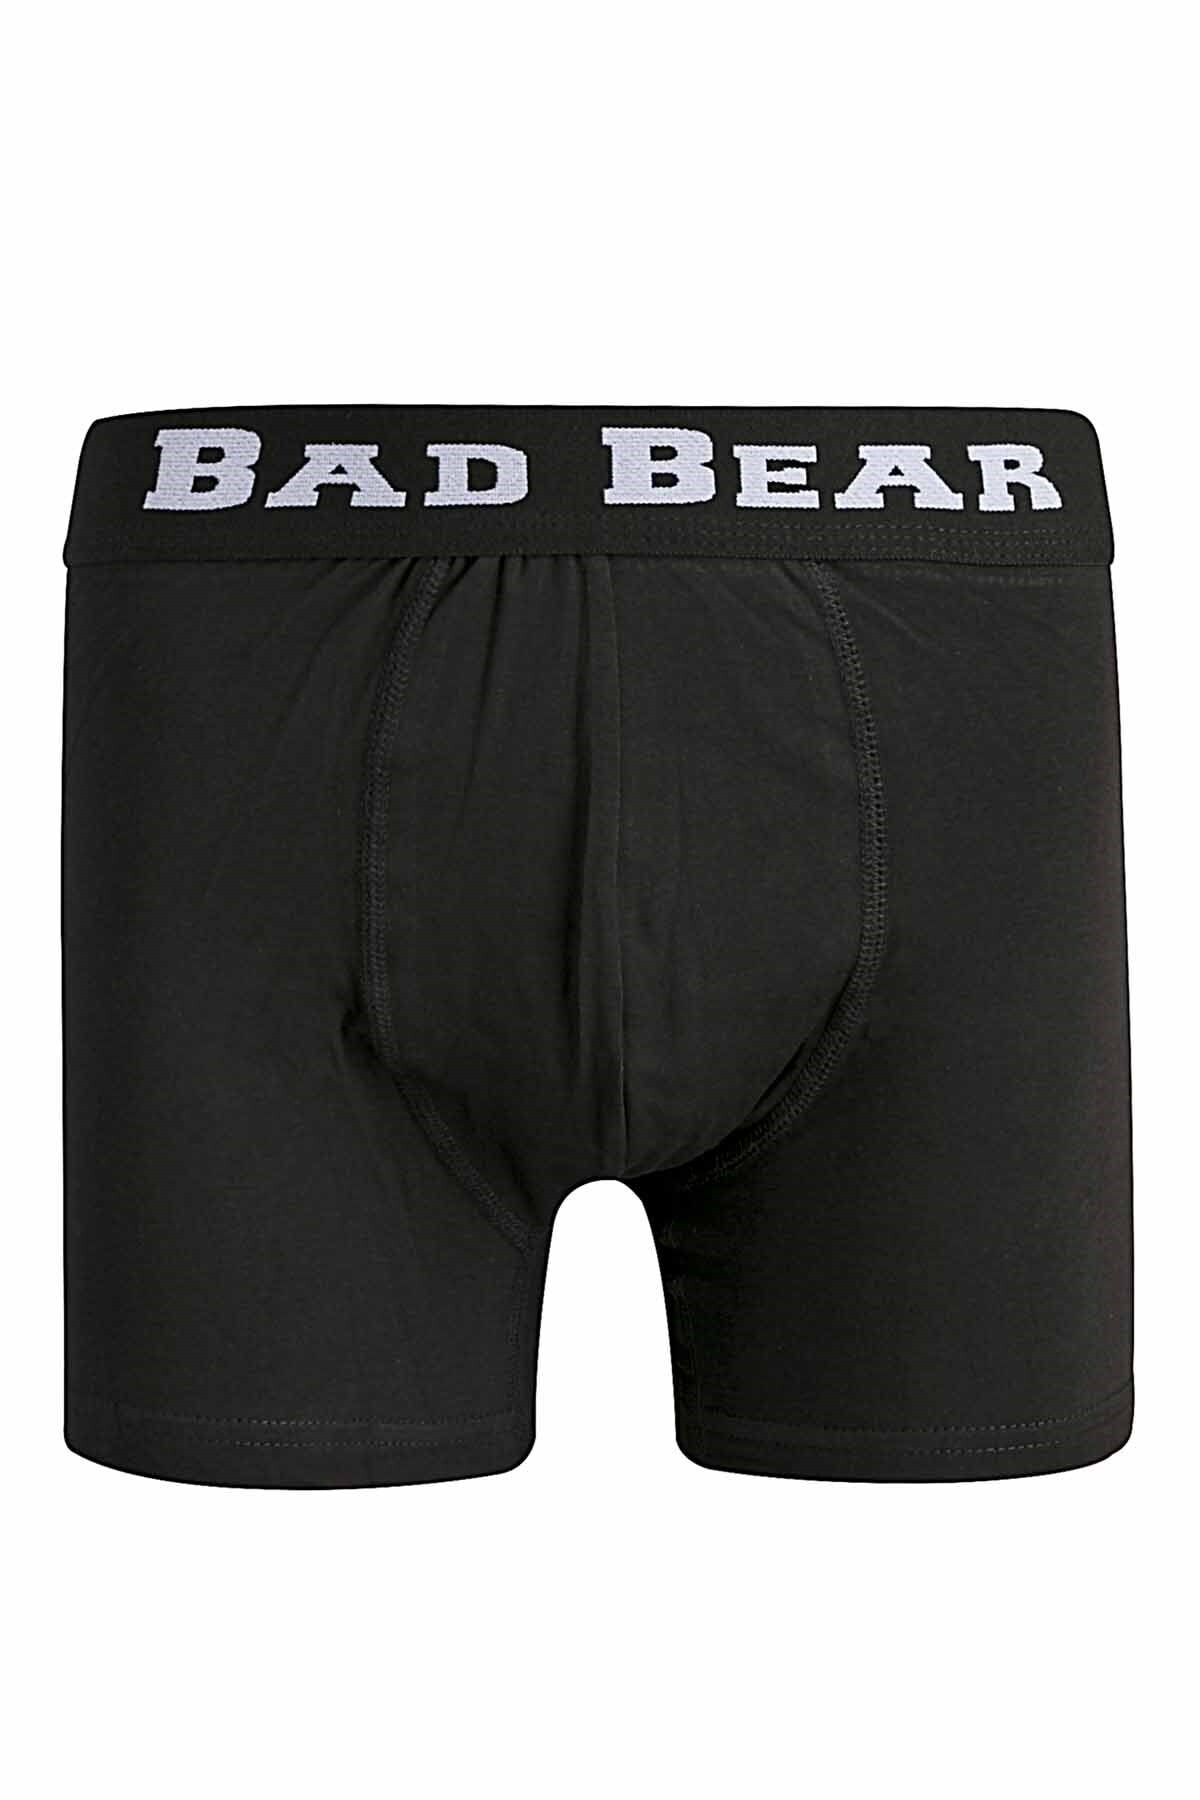 Bad Bear Solıd Uw Erkek Boxer 18.01.03.019nıght 2